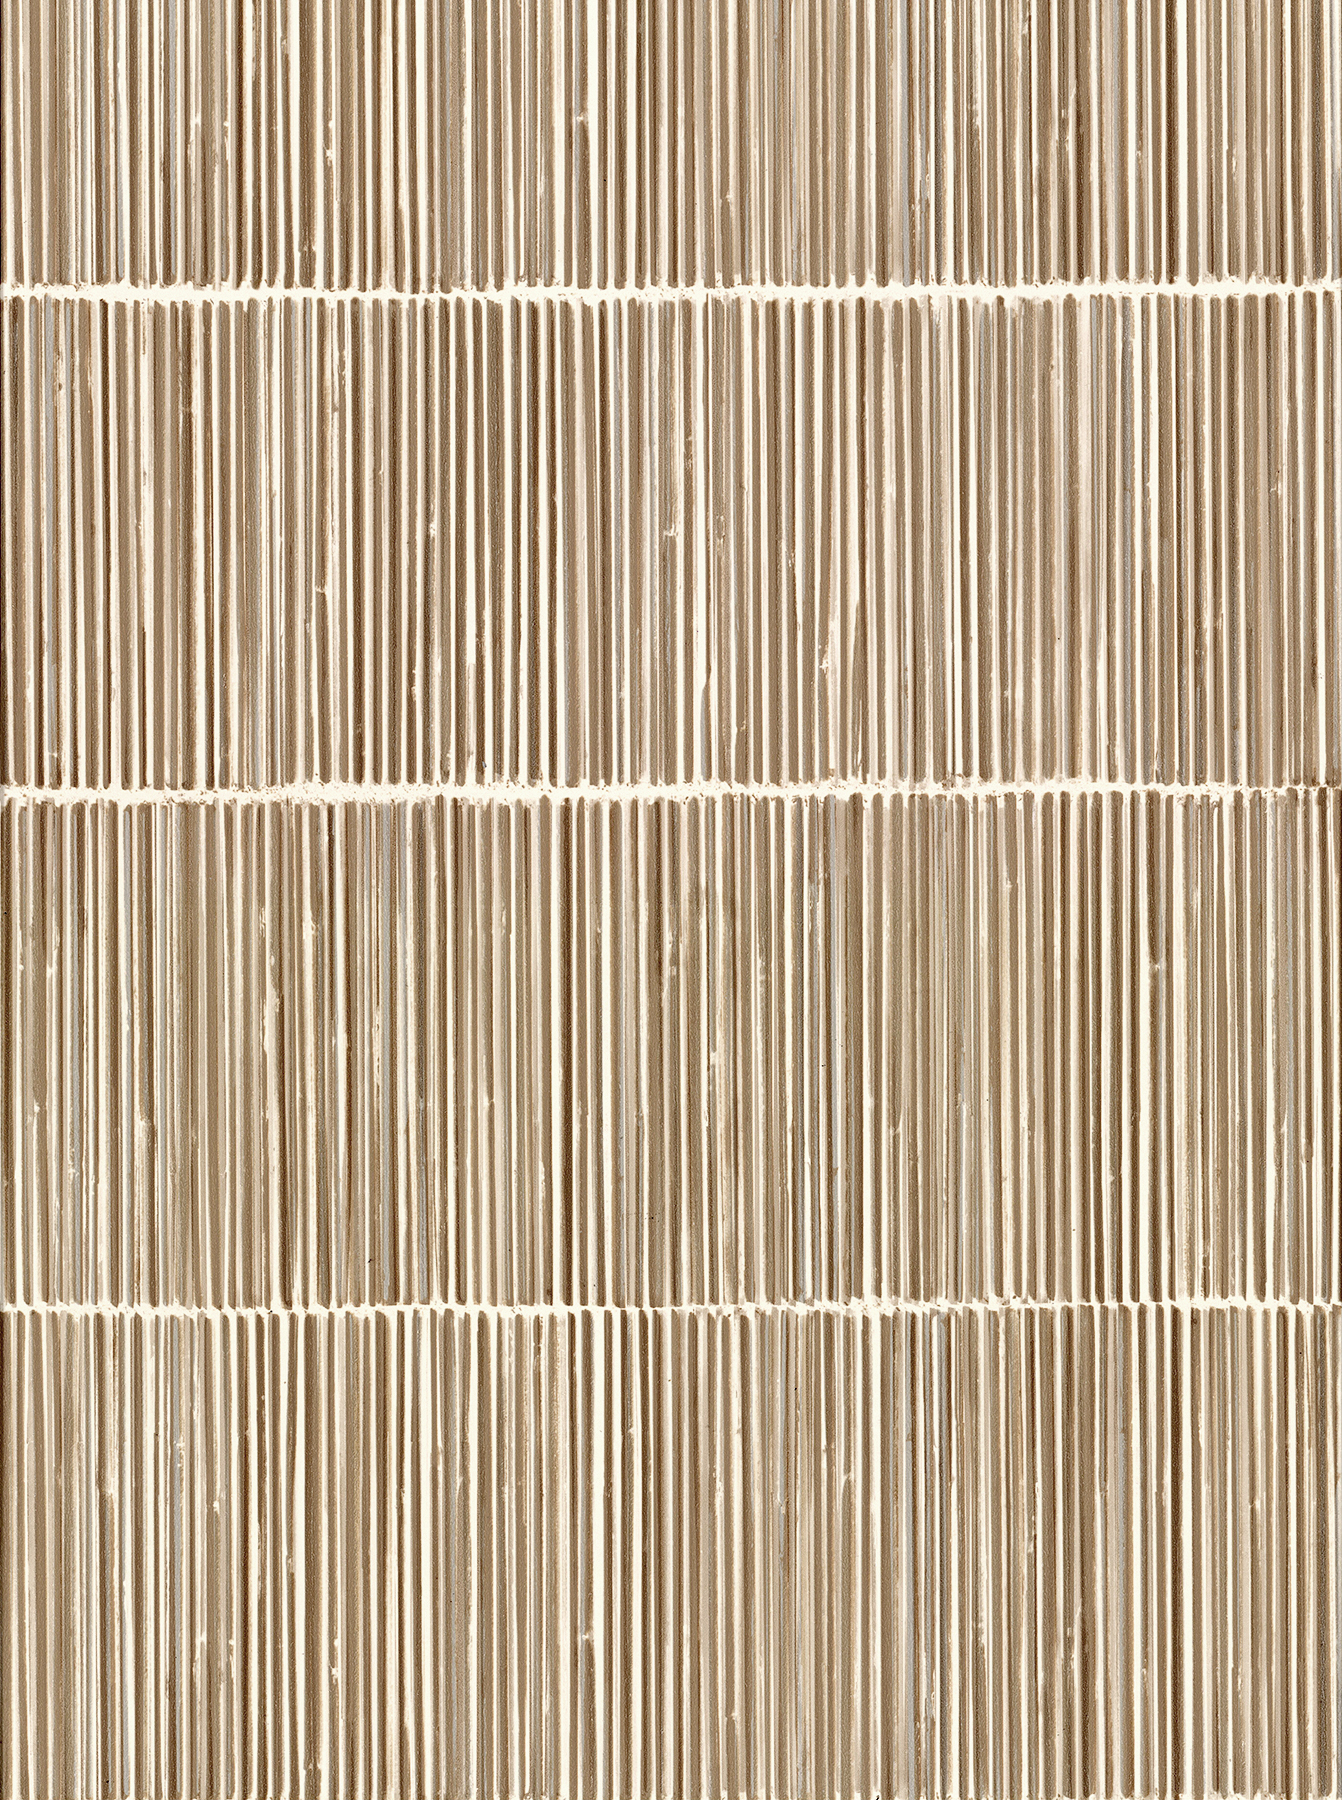 Picture of Aspen Neutral Natural Stripe Wallpaper